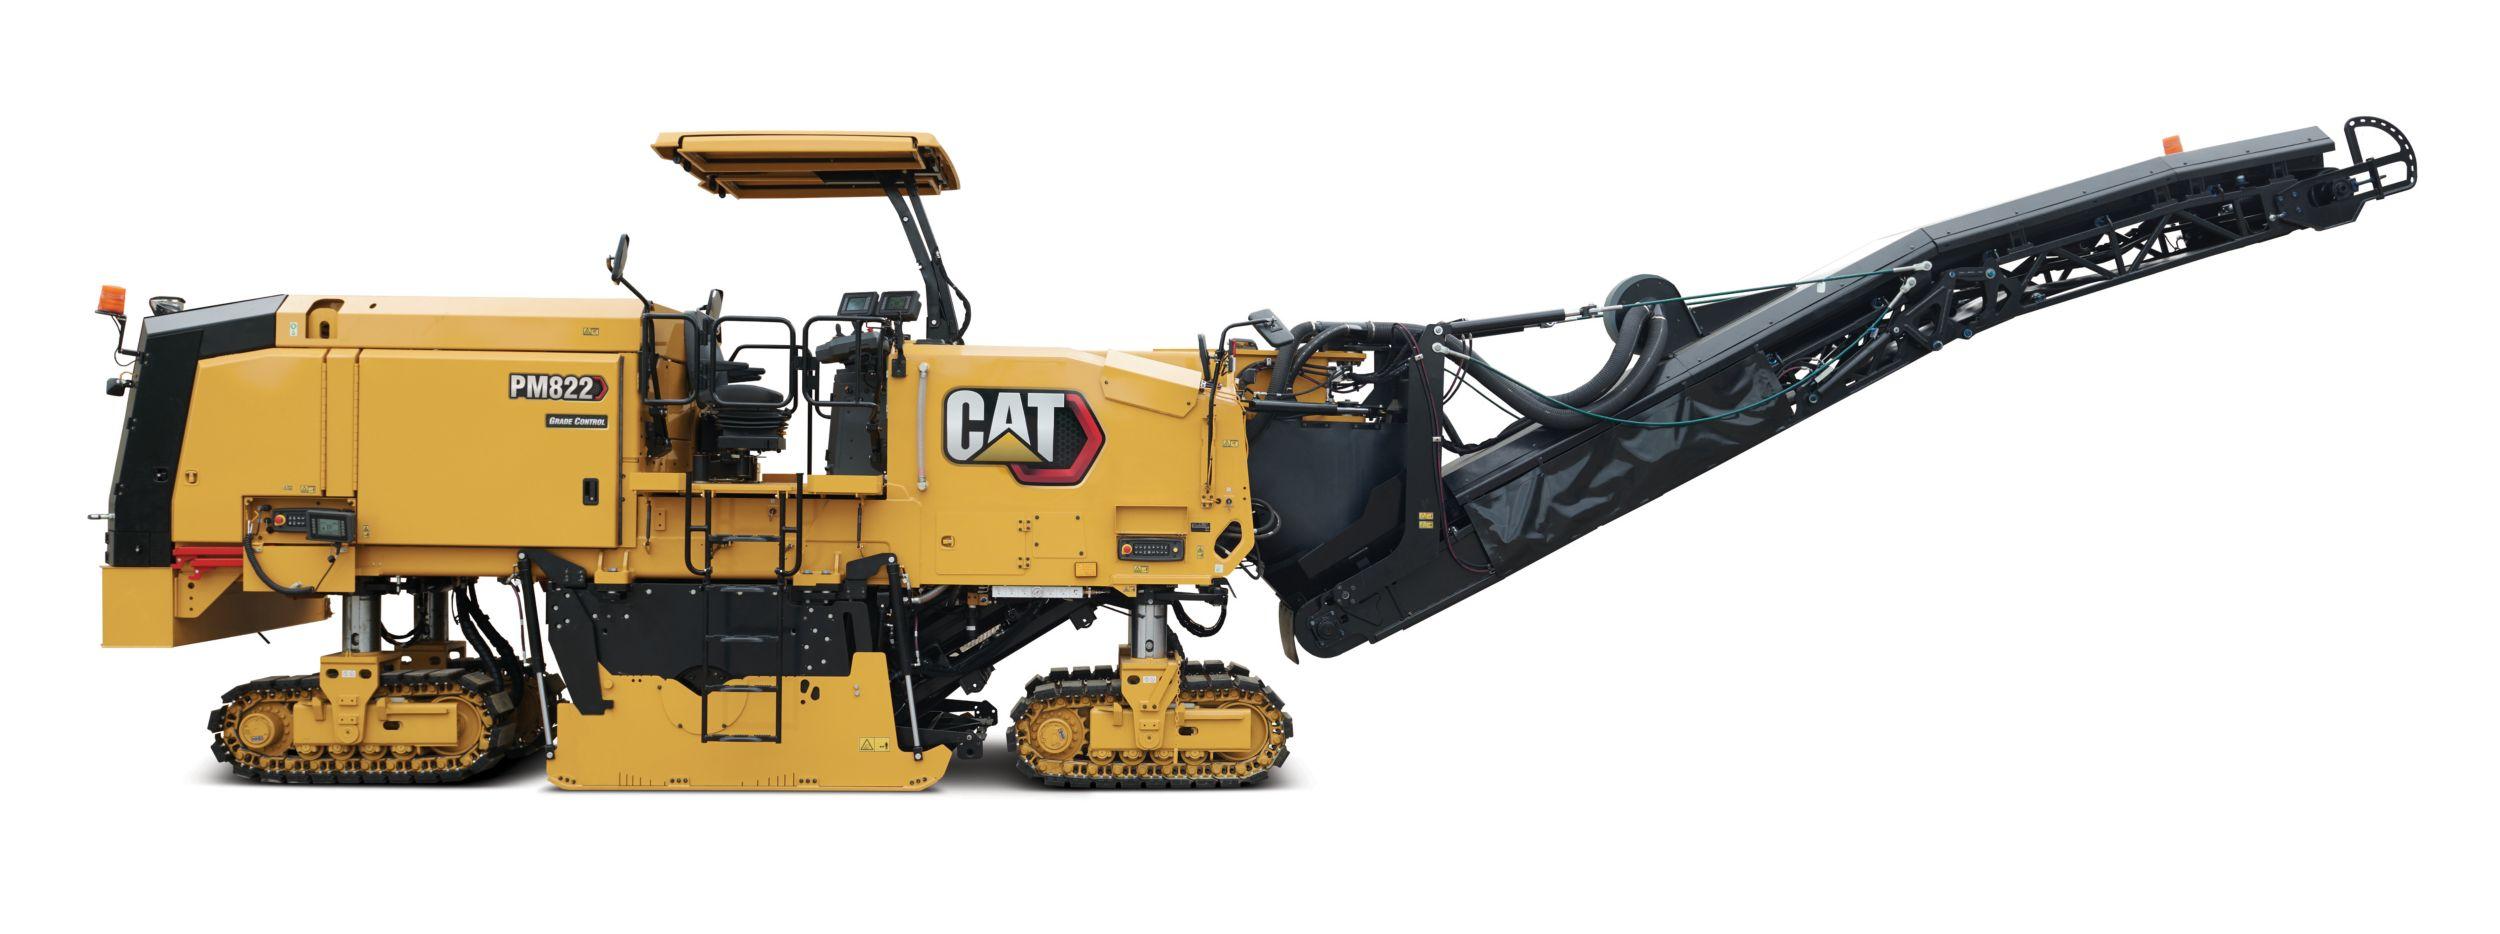 Cat PM822 Kaltfräse